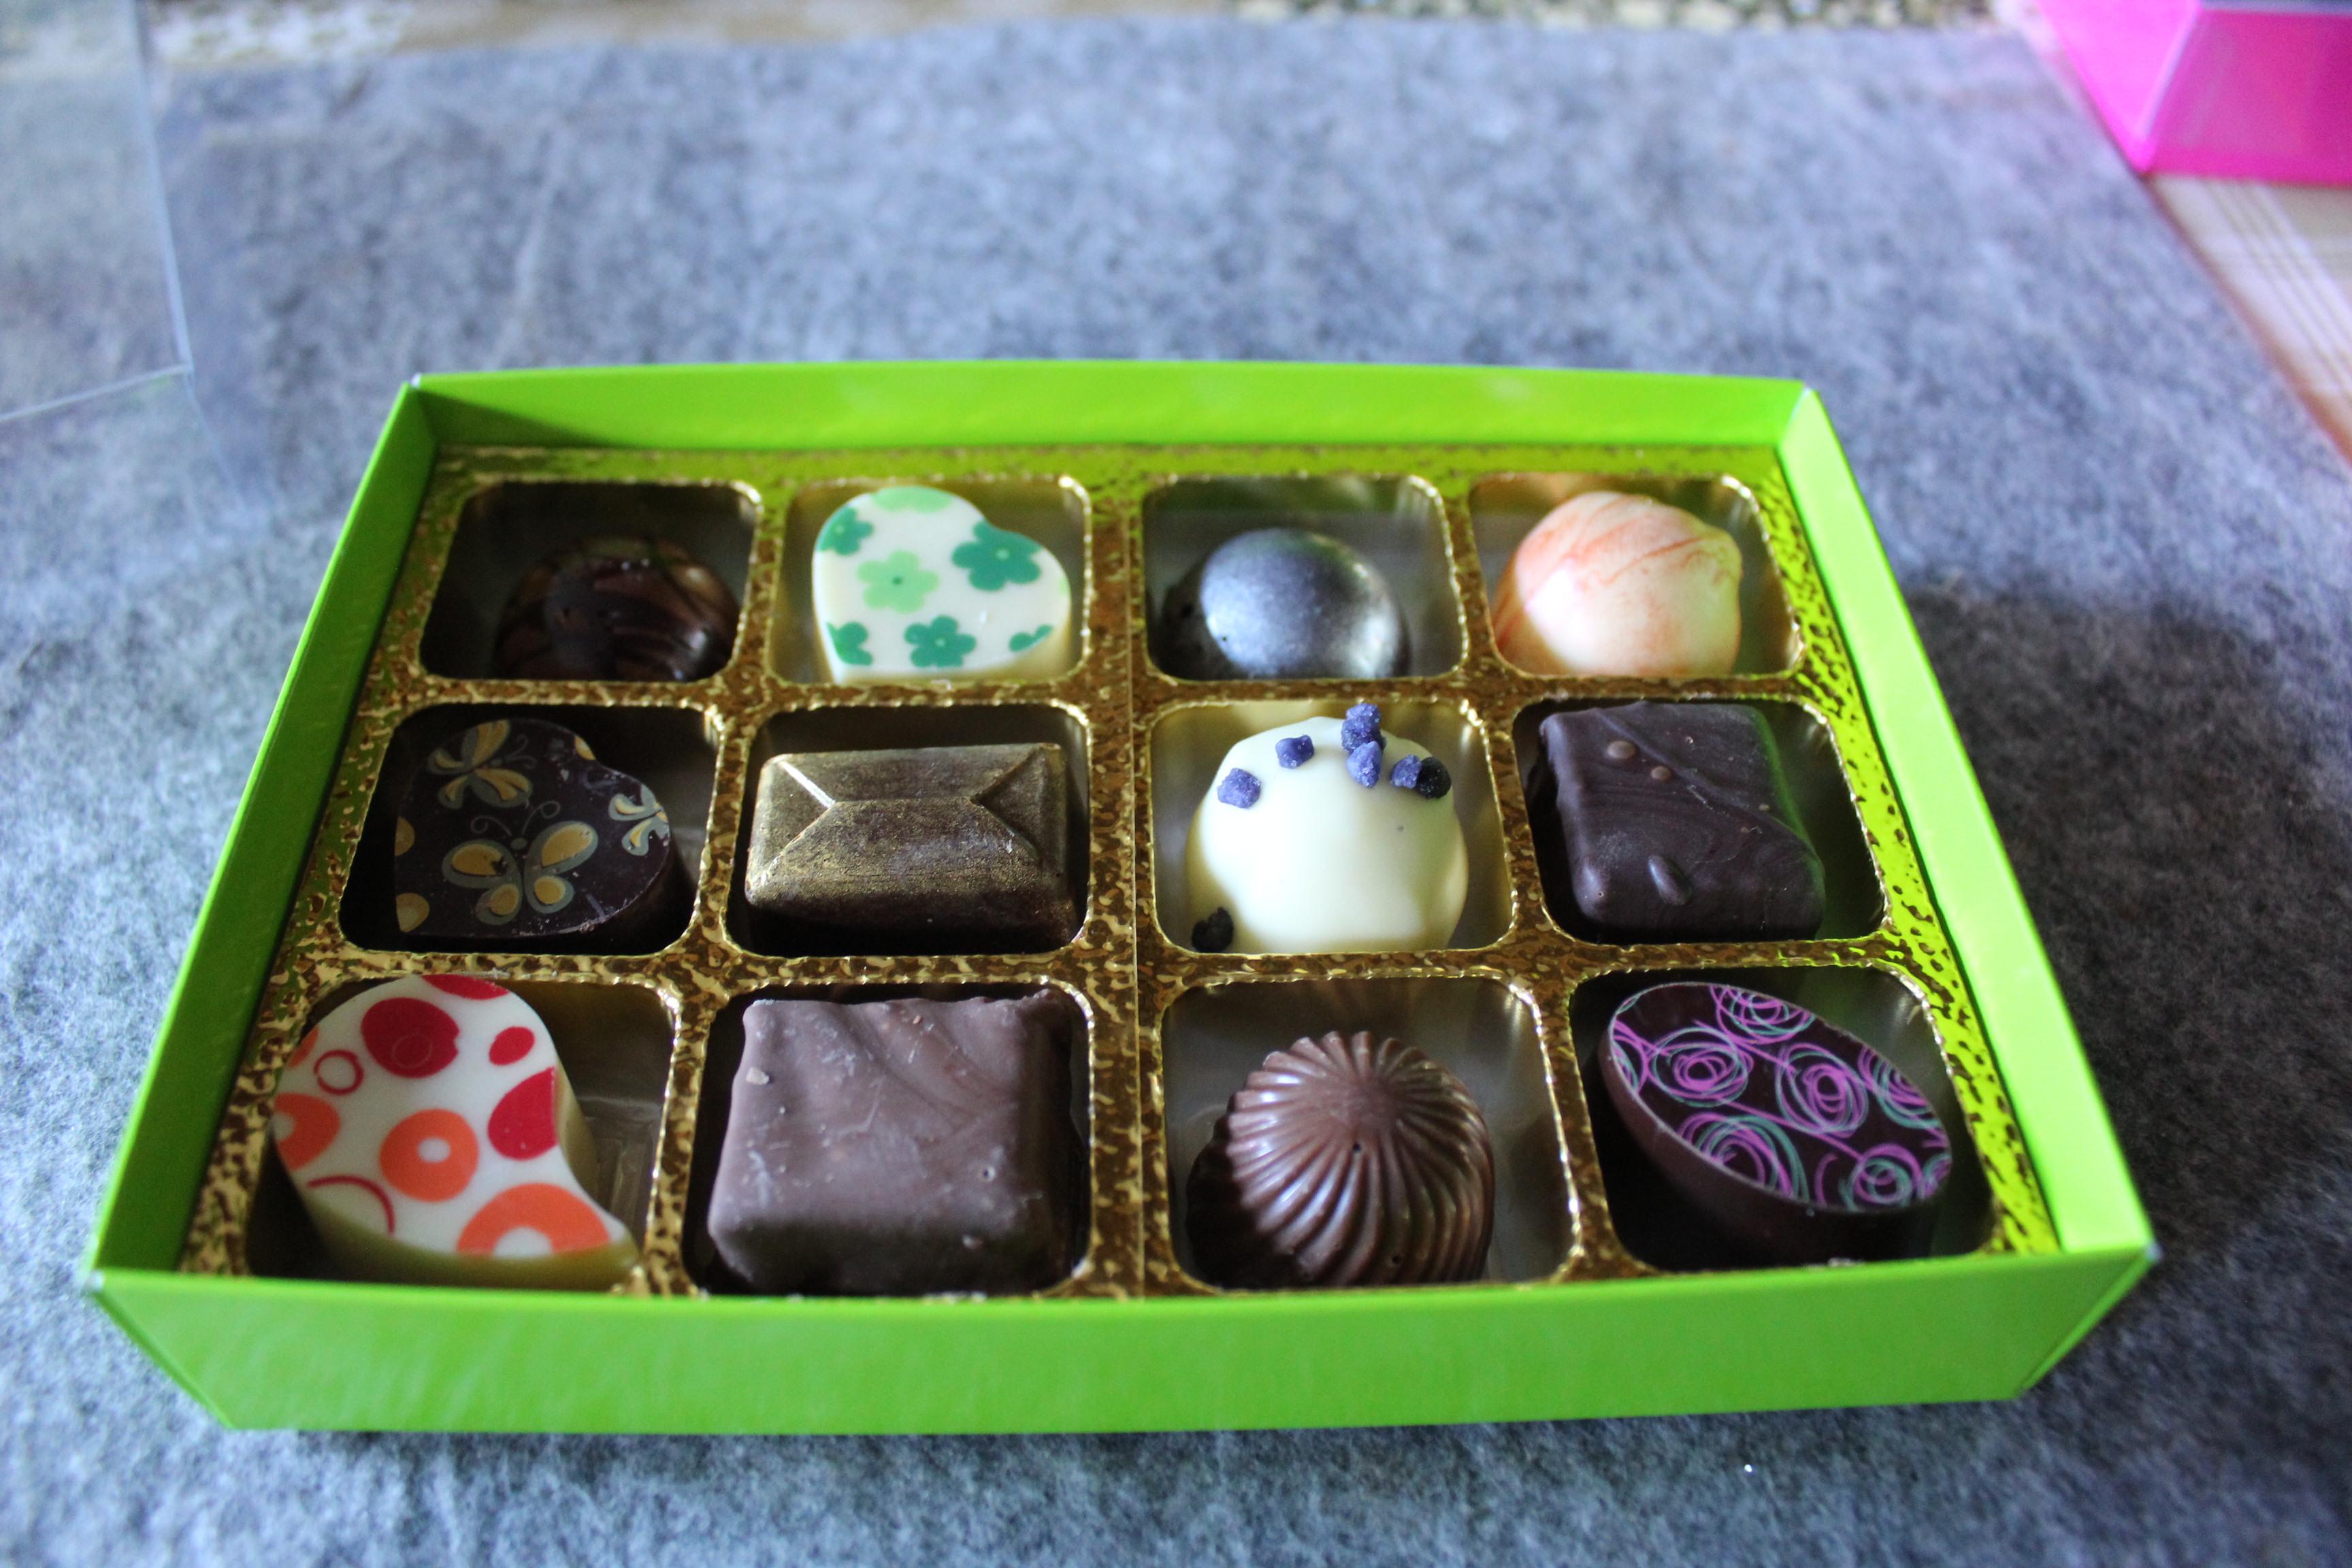 Box of 12 mixed chocolates